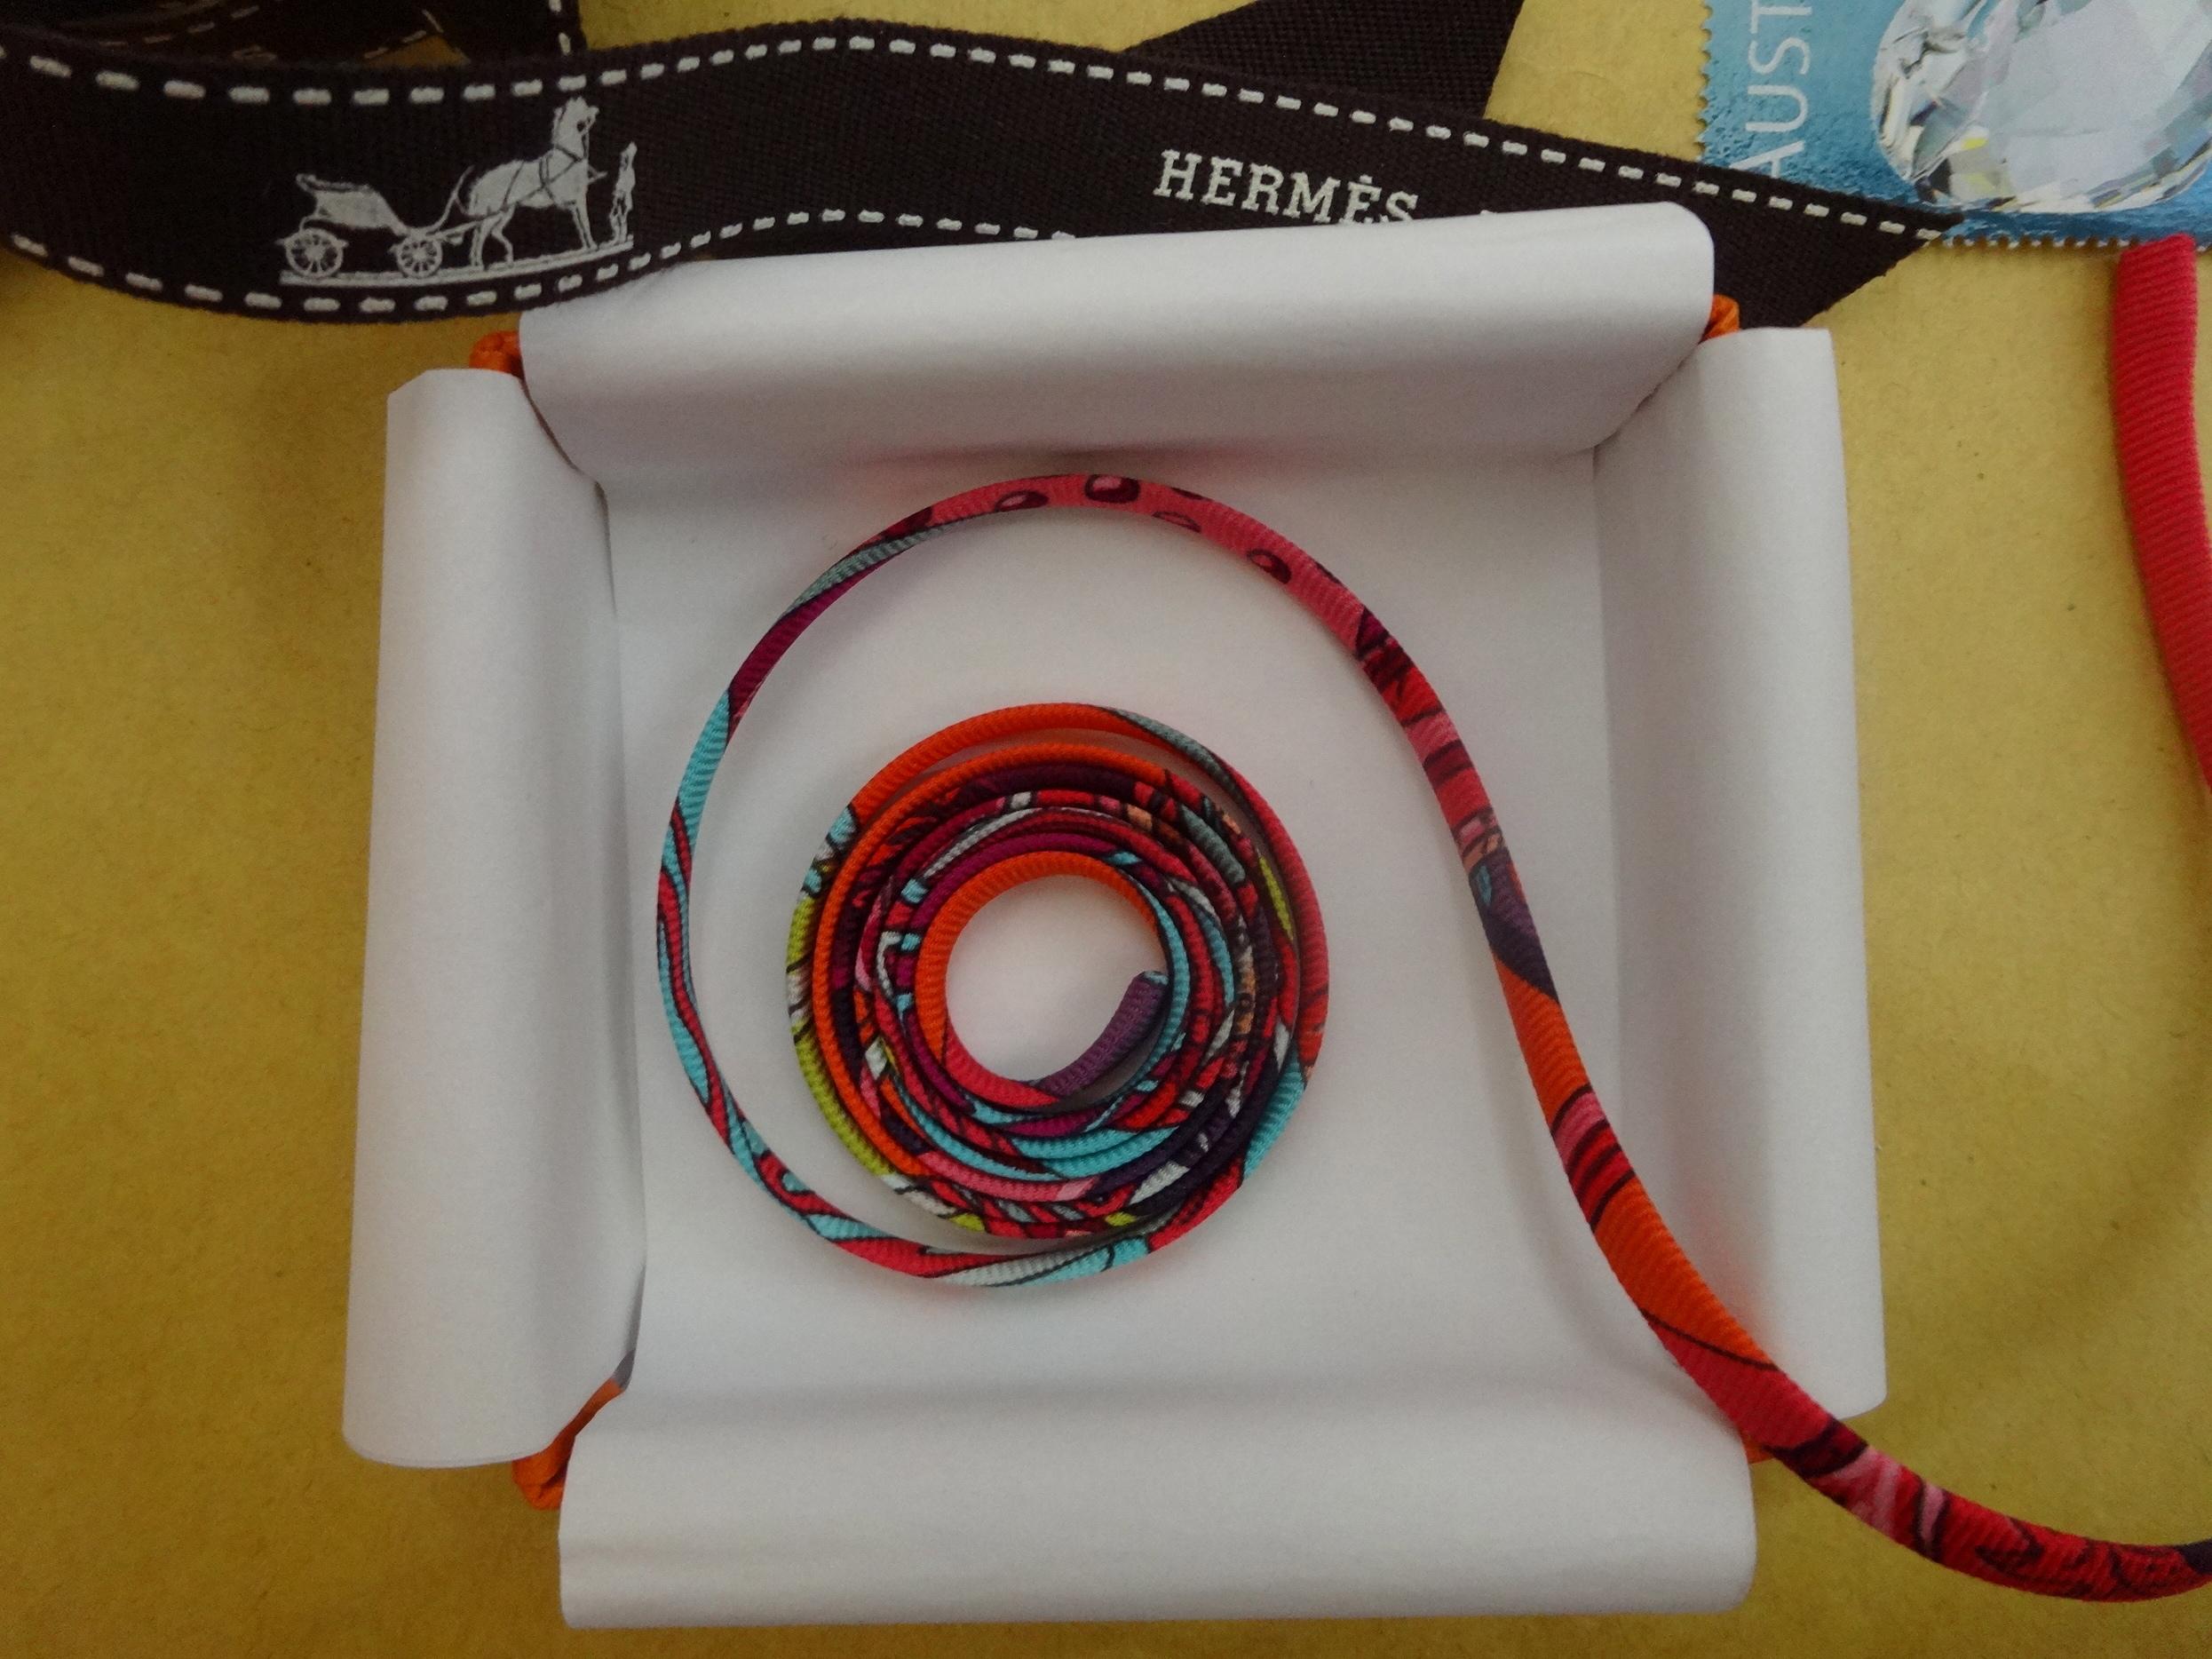 Silk Spaghetti - Hermès - Seidenspaghetti